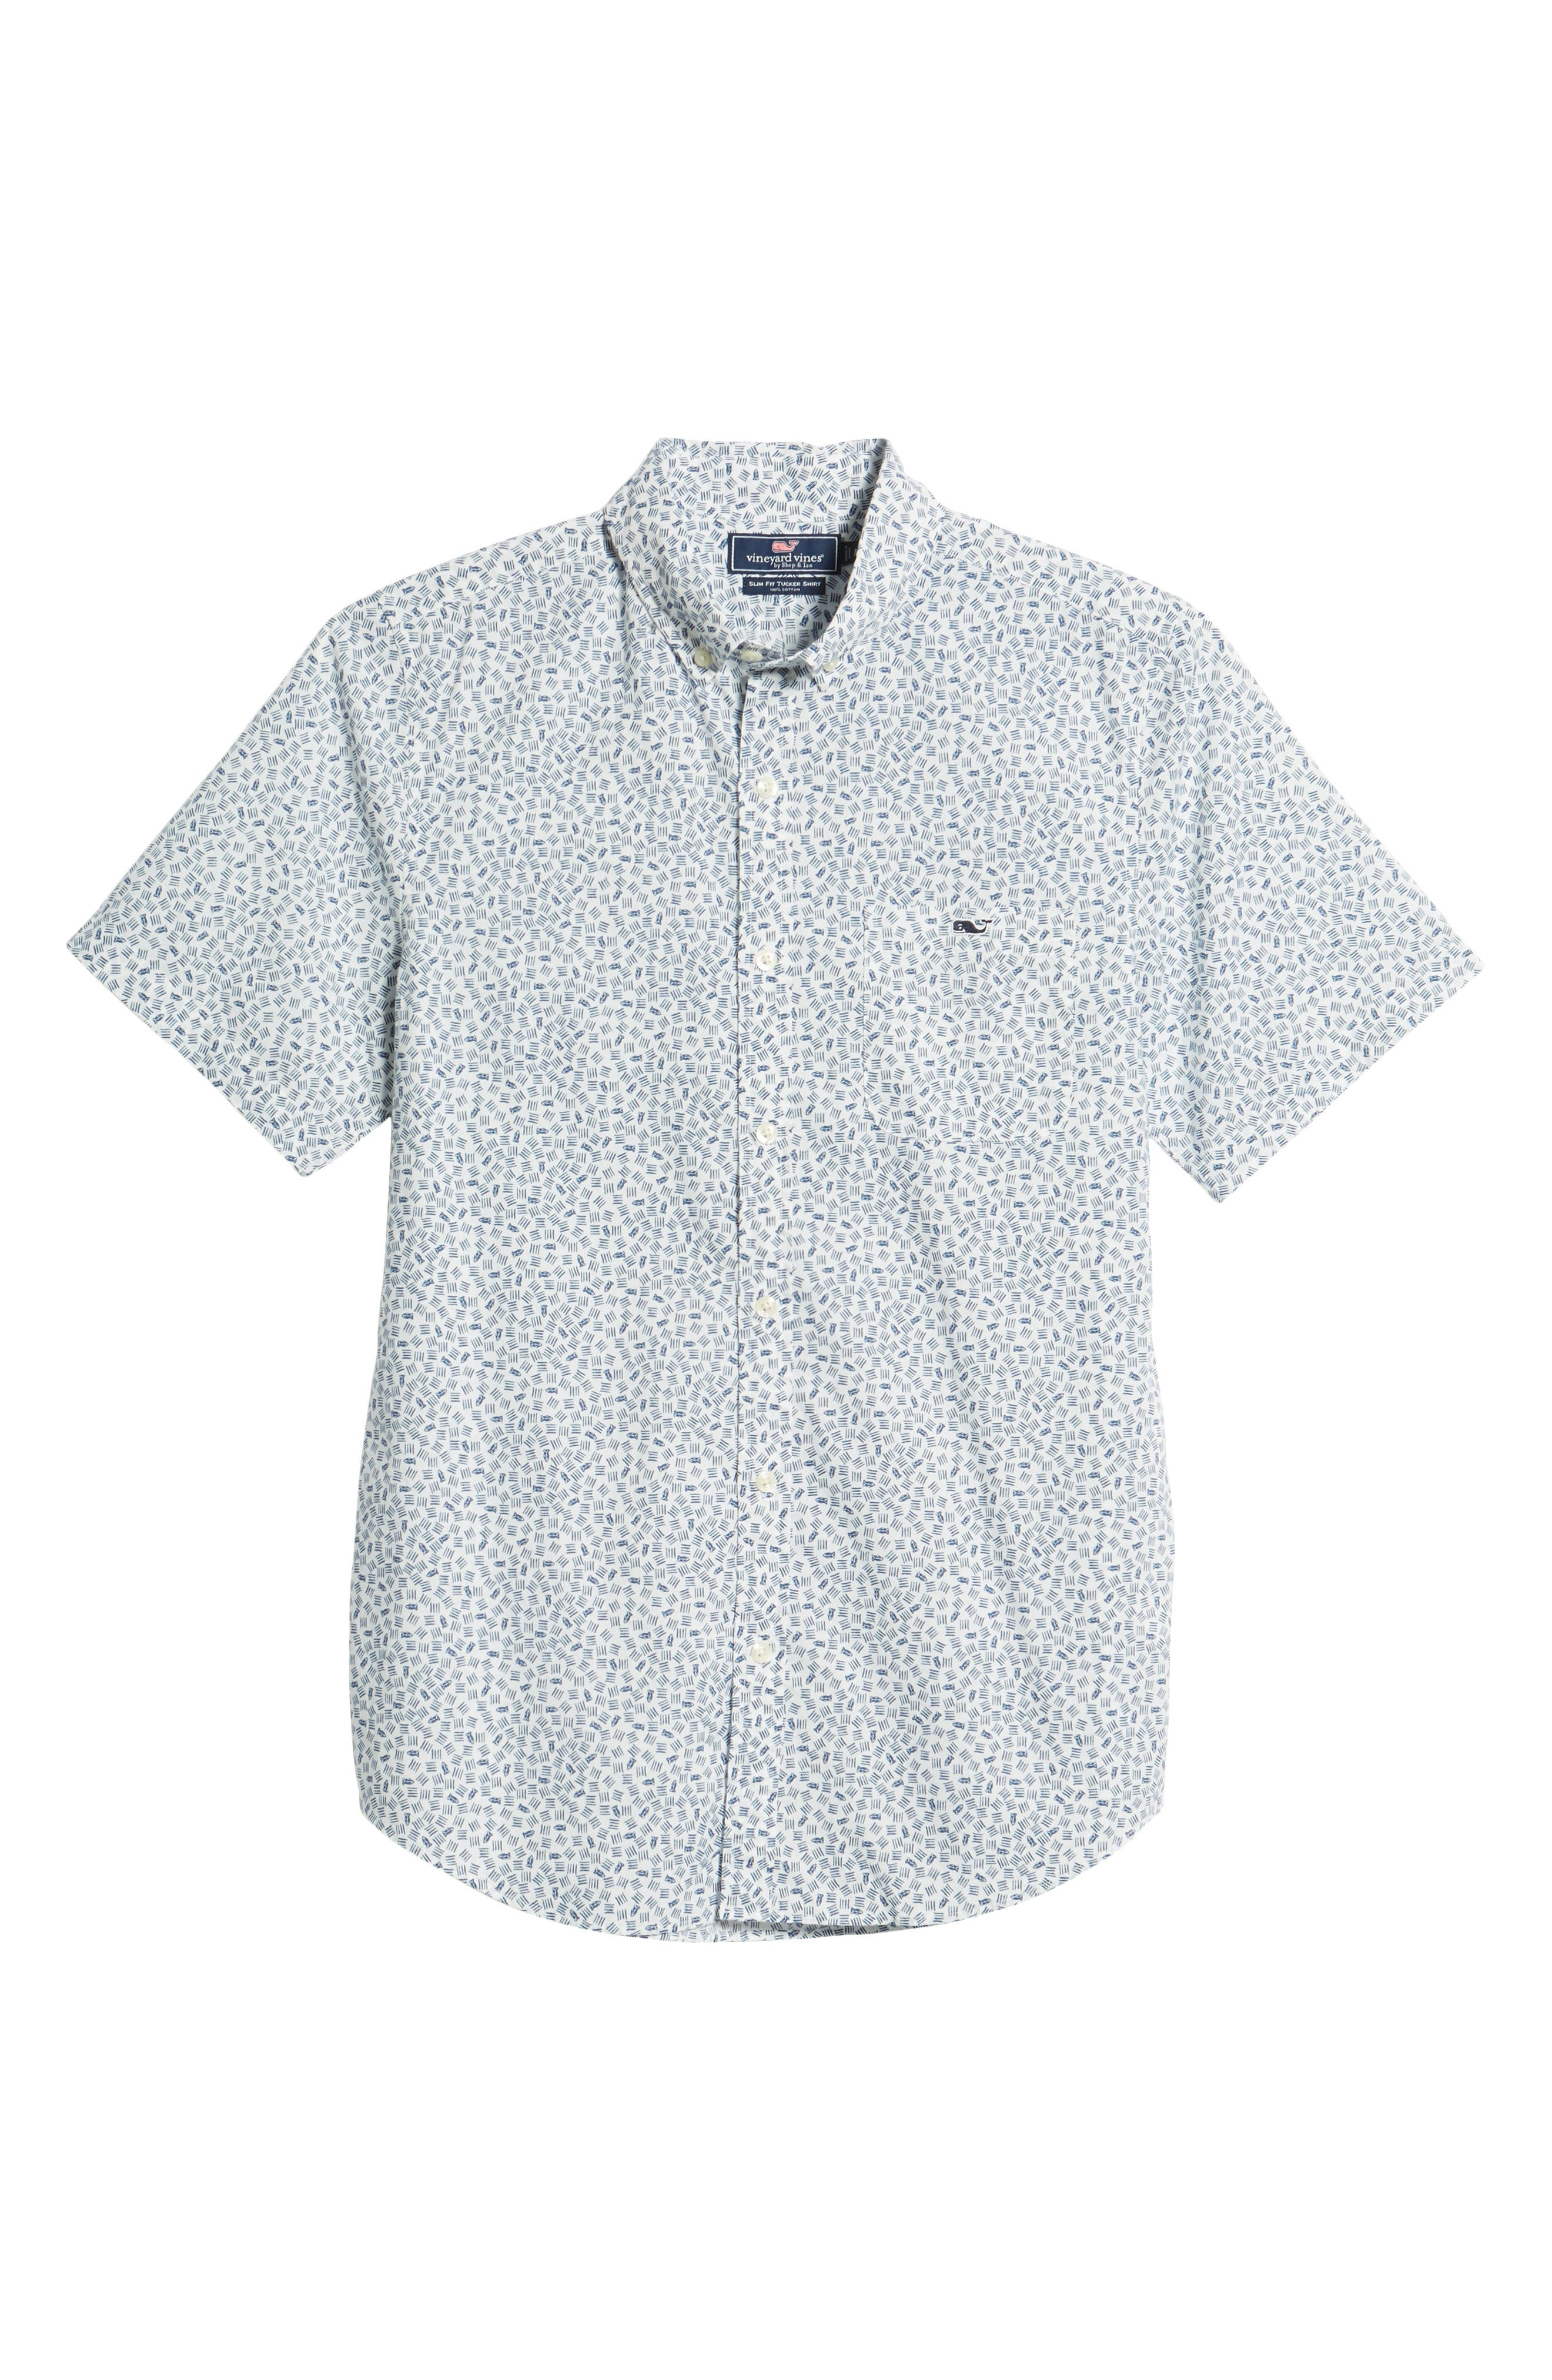 Fish Dash Tucker Slim Fit Sport Shirt,                             Alternate thumbnail 6, color,                             White Cap